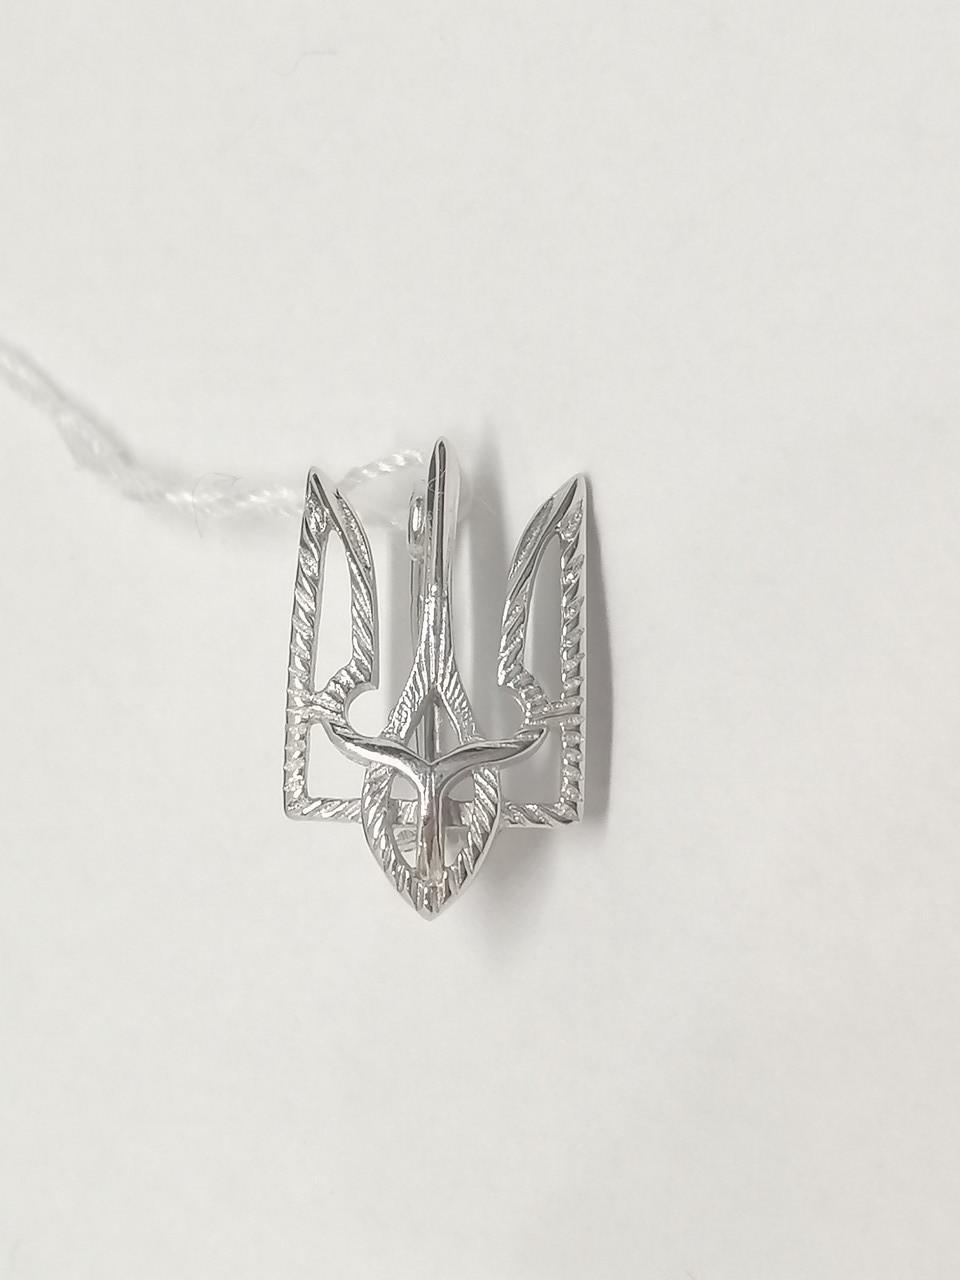 Серебряный значок Трезубец. Артикул 660080С